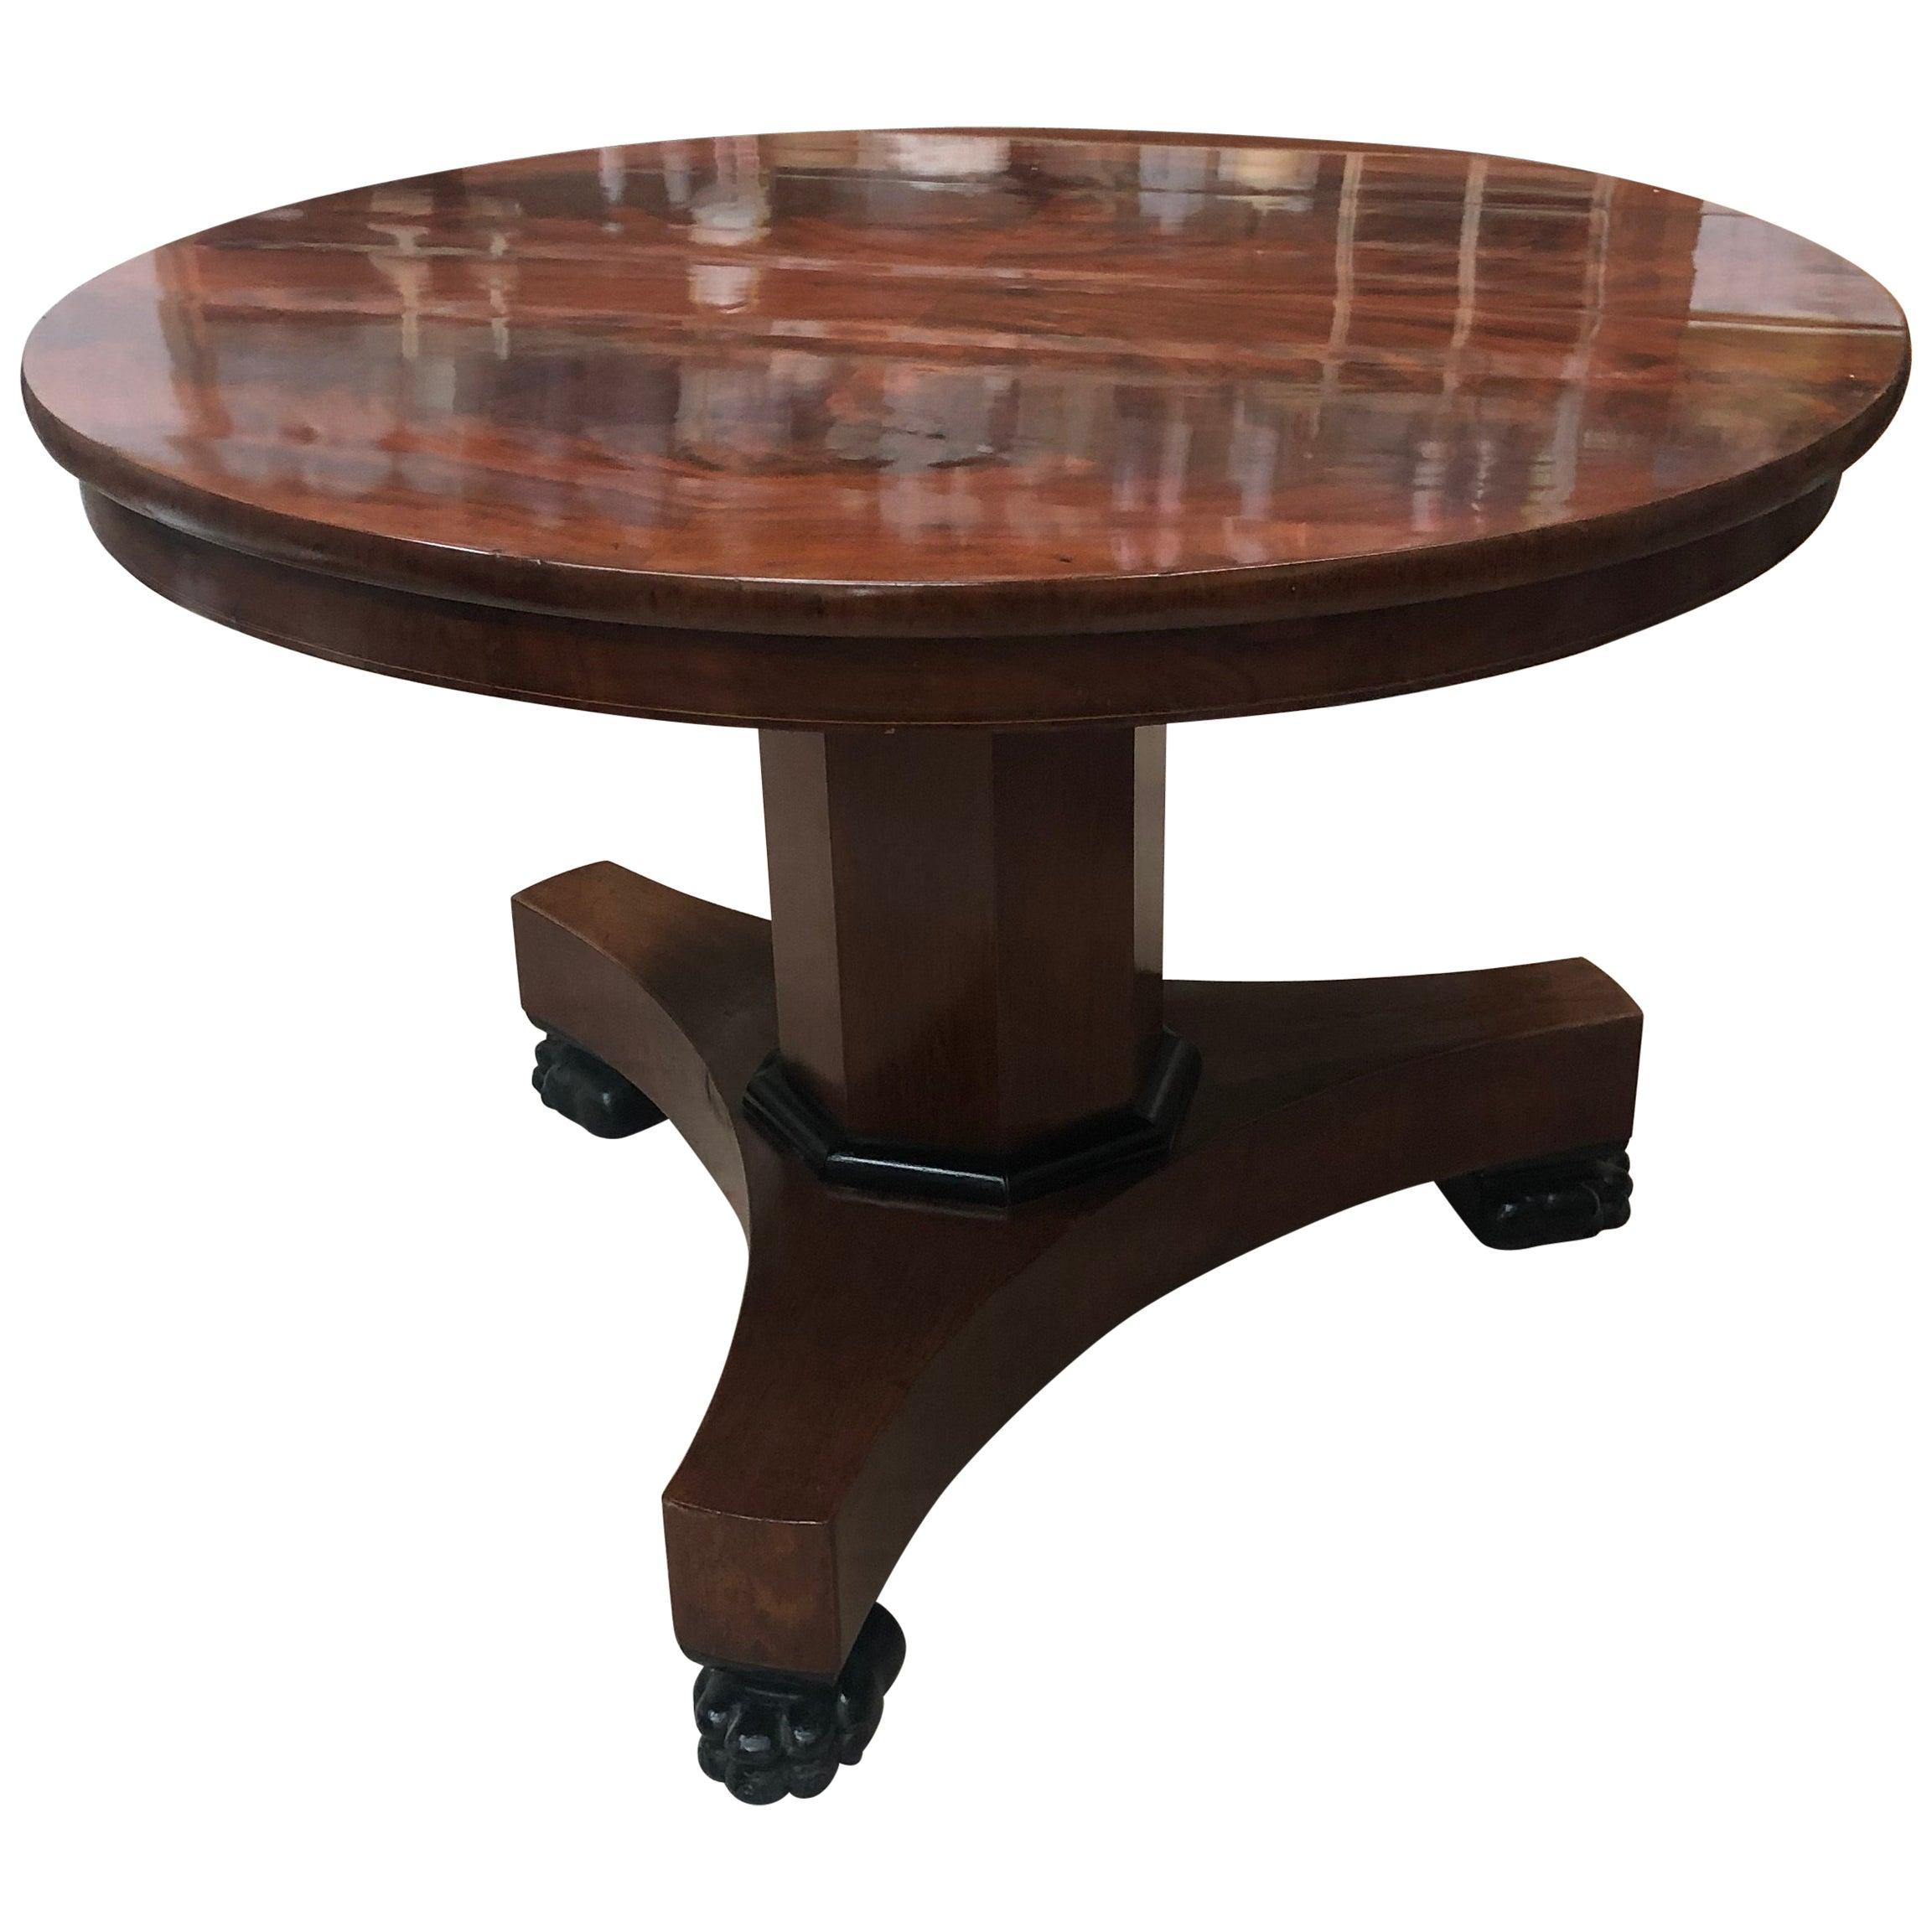 Empire Mahogany Tilt-Top Dining Table, 19th Century